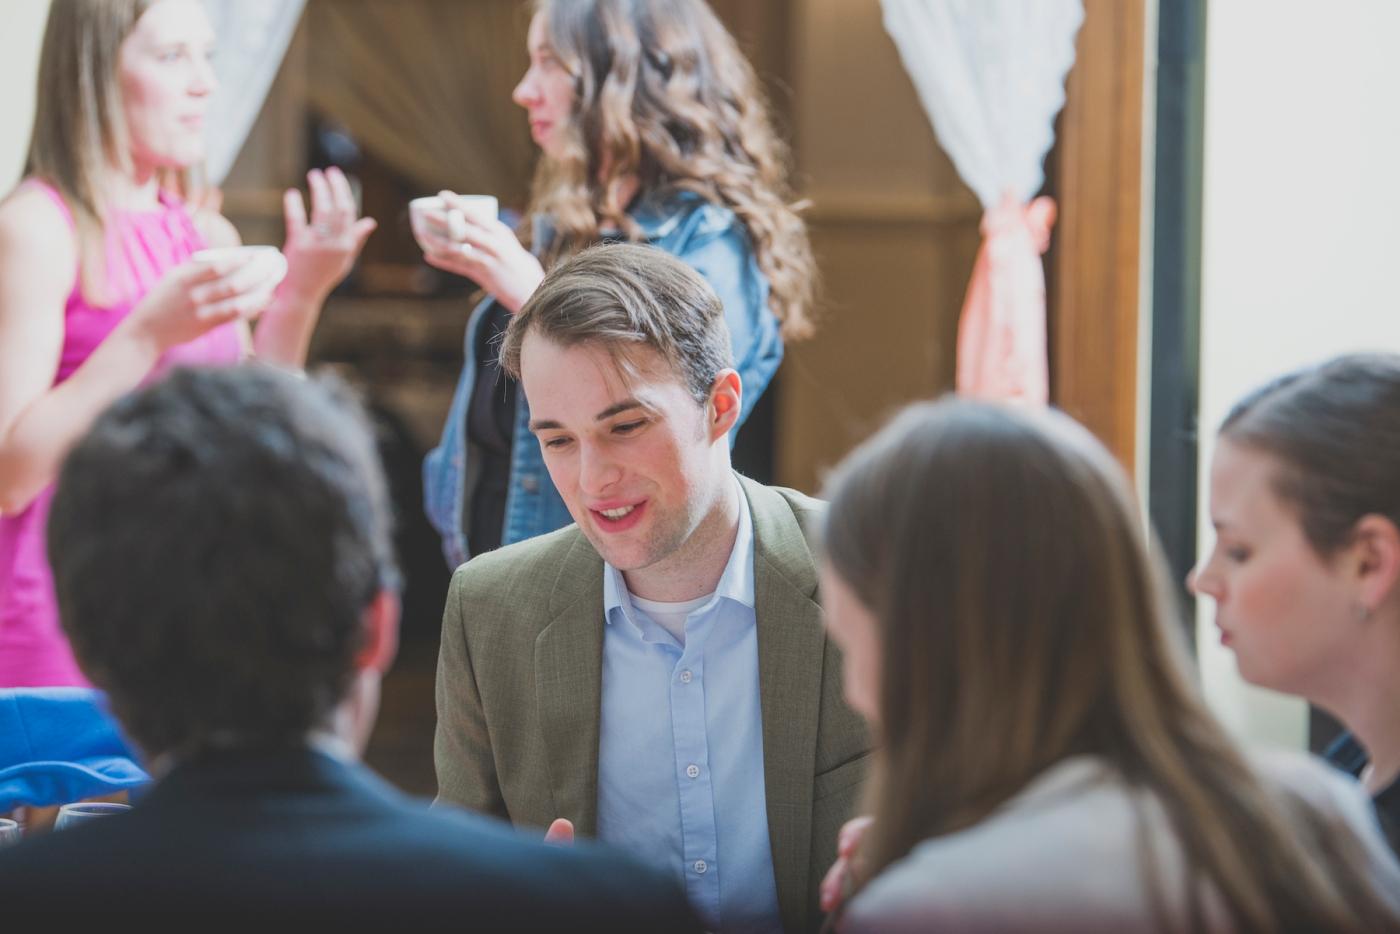 DSC_3181Everett_Wedding_Ballroom_Jane_Speleers_photography_Rachel_and_Edmund_reception_2017